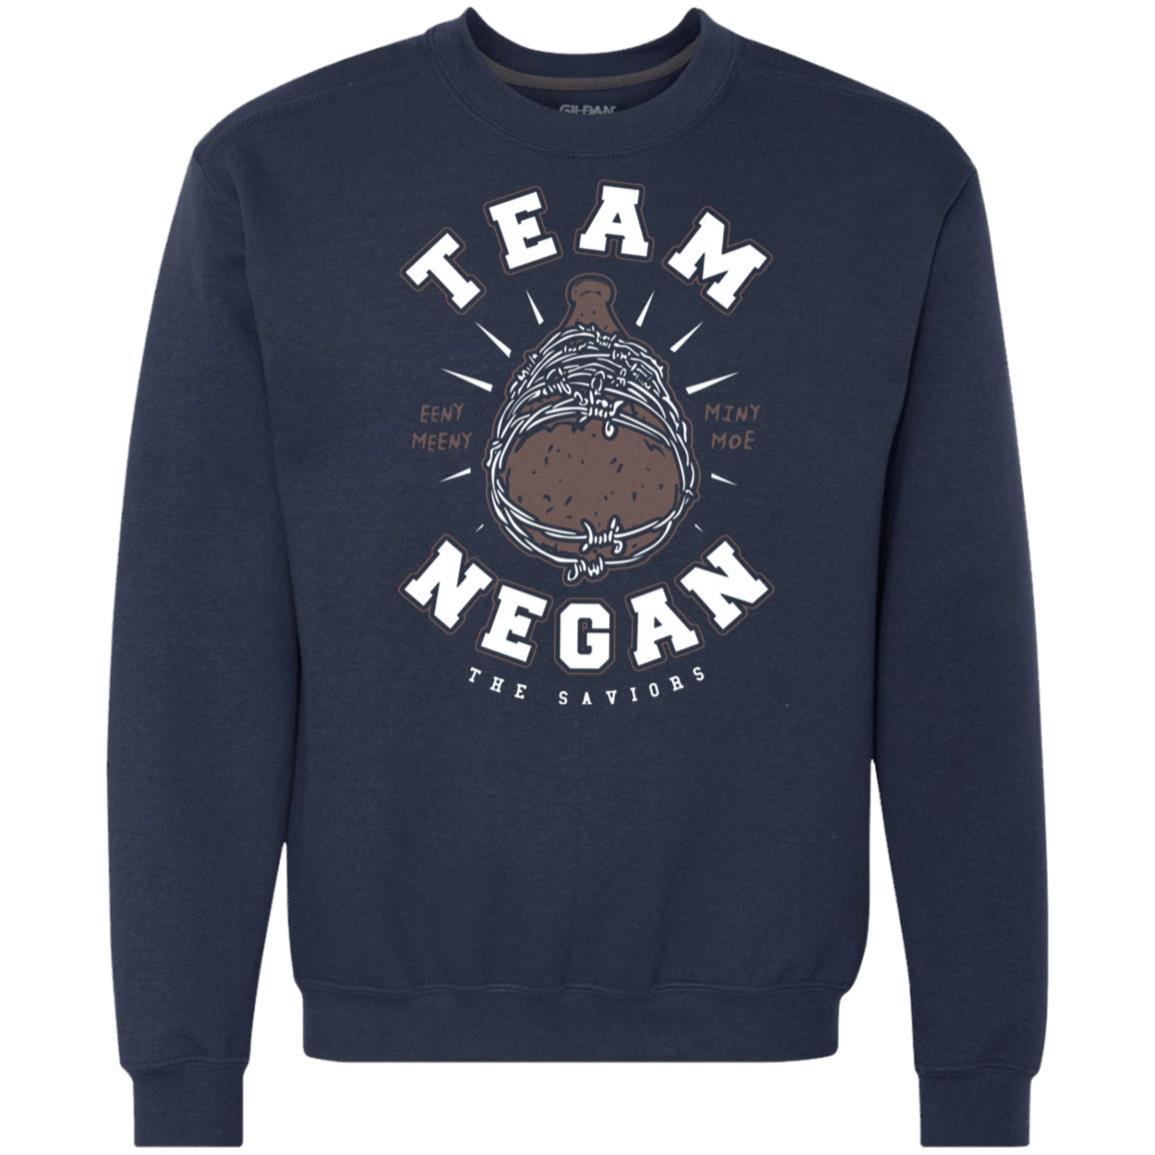 Team Negan The Walking Dead Negan Lucille T shirts Hoodies, Sweatshirts